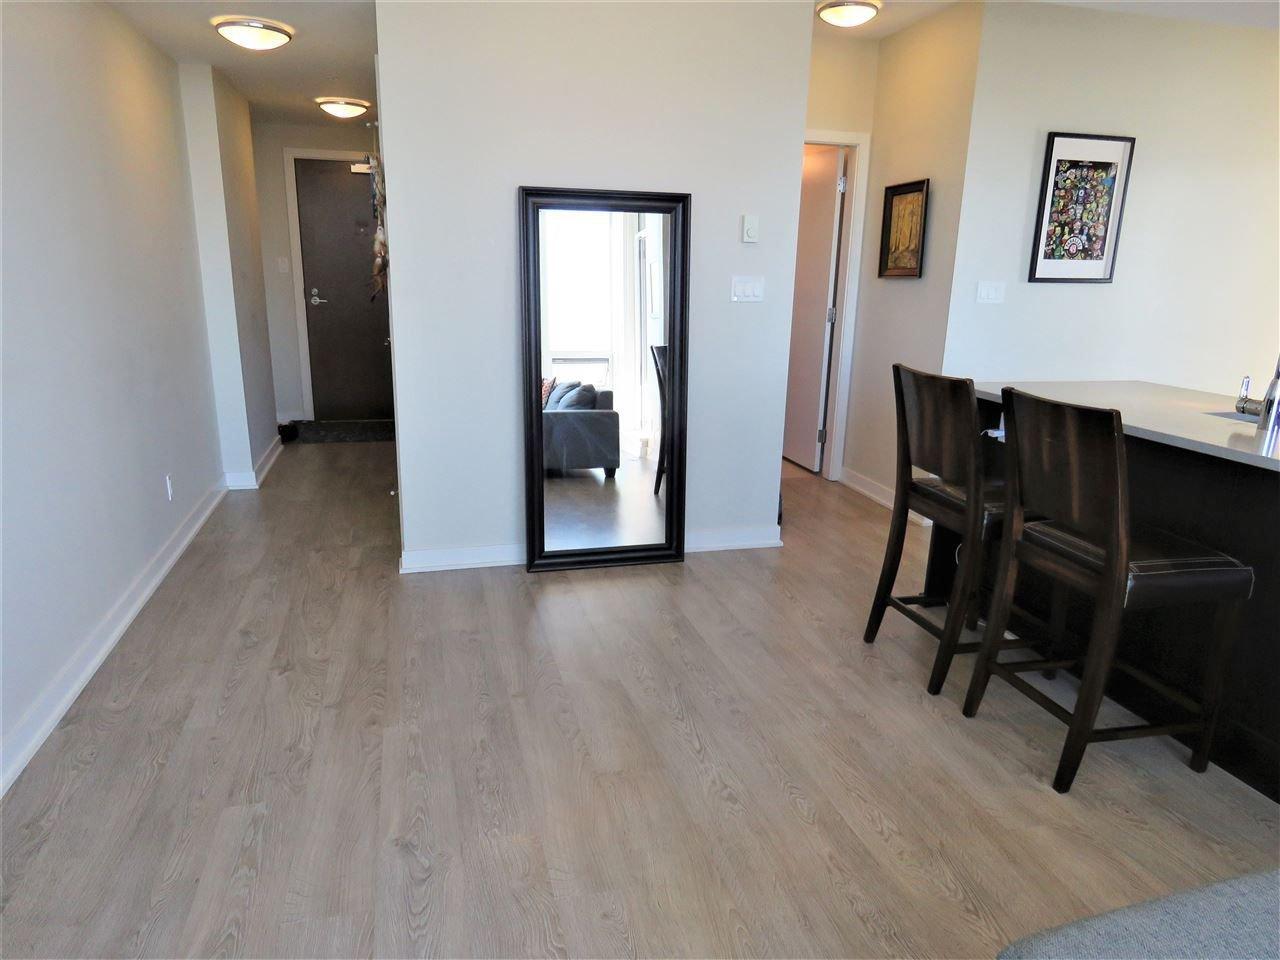 "Photo 5: Photos: 2107 2975 ATLANTIC Avenue in Coquitlam: North Coquitlam Condo for sale in ""GRAND CENTRAL 3"" : MLS®# R2217722"